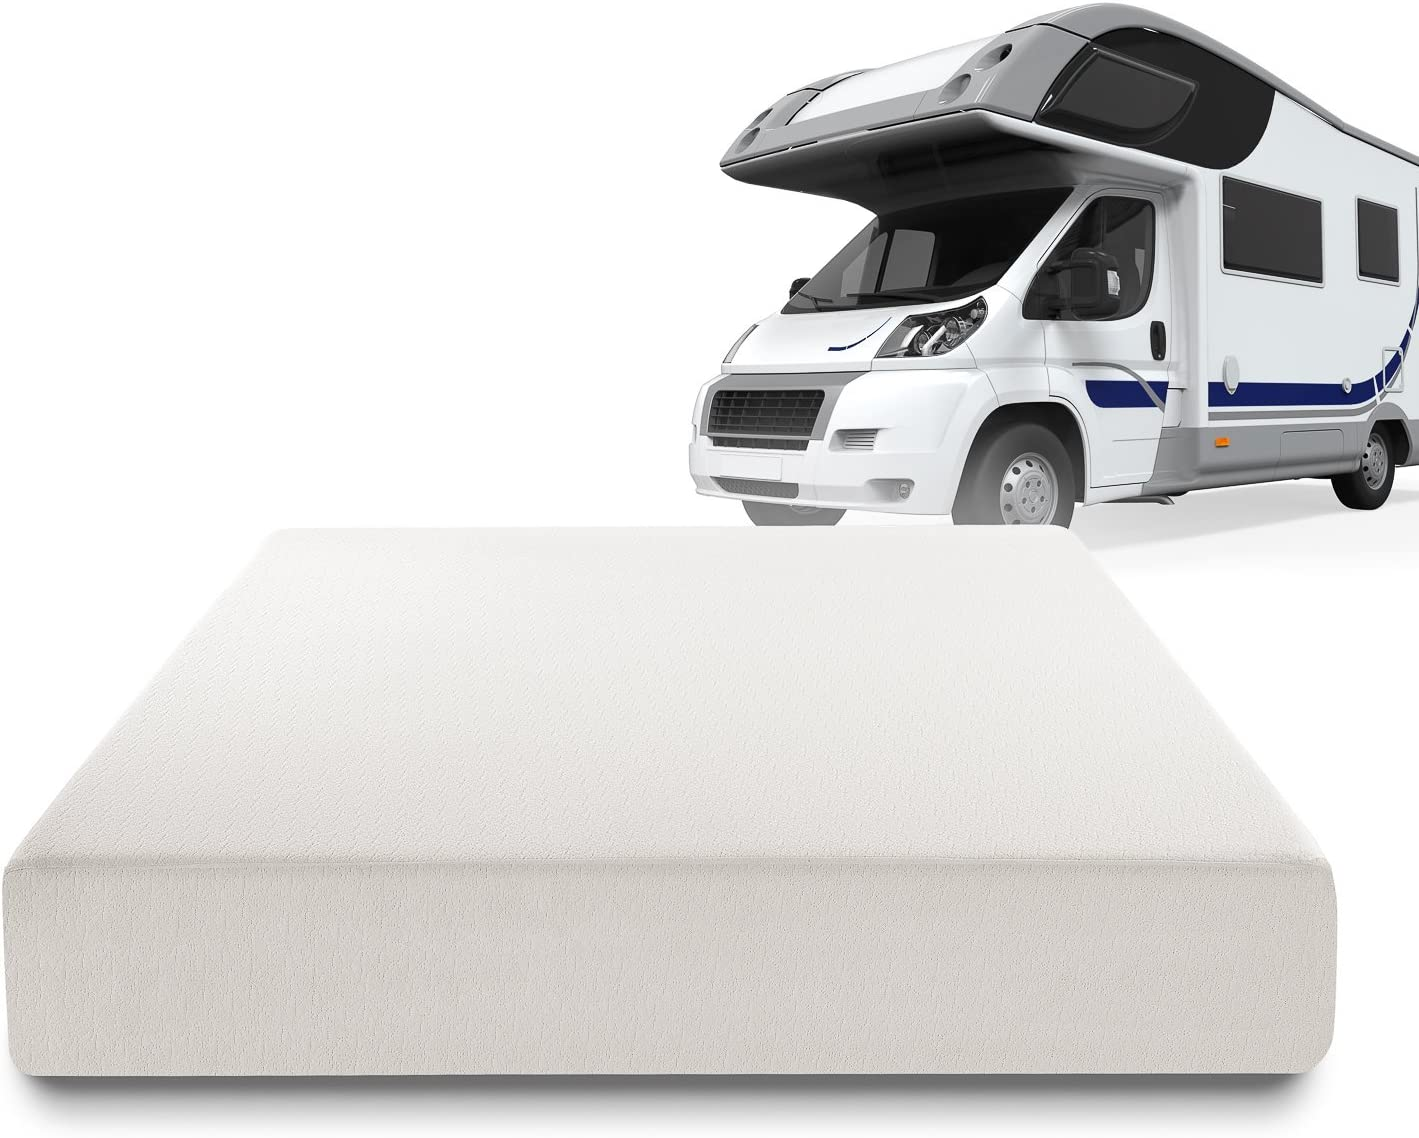 Zinus RV-AZ-FMS-10SQ Sleep Master Deluxe Memory Foam 10 Inch RV//Camper//Trailer//Truck Mattress Short Queen